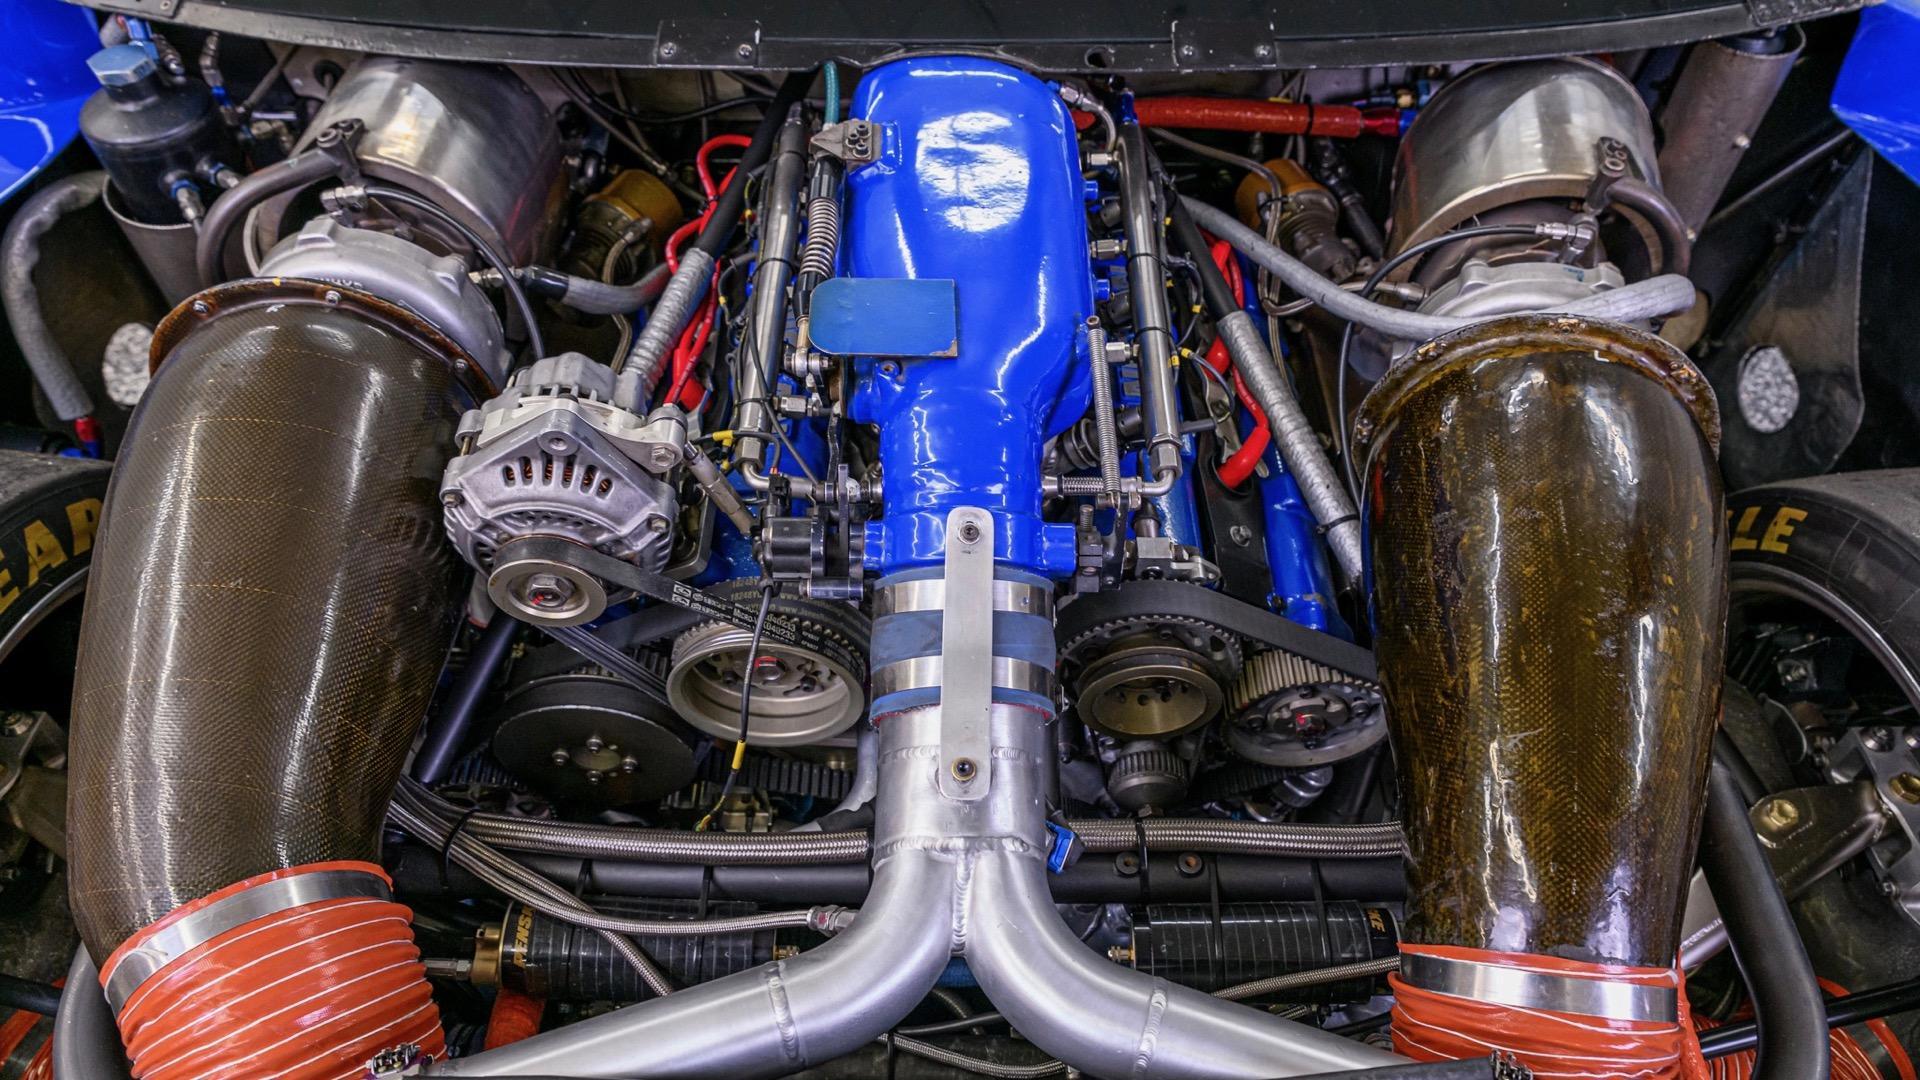 1990 nissan 300zx twin turbo imsa gto race car photo by bring a trailer 100791727 h